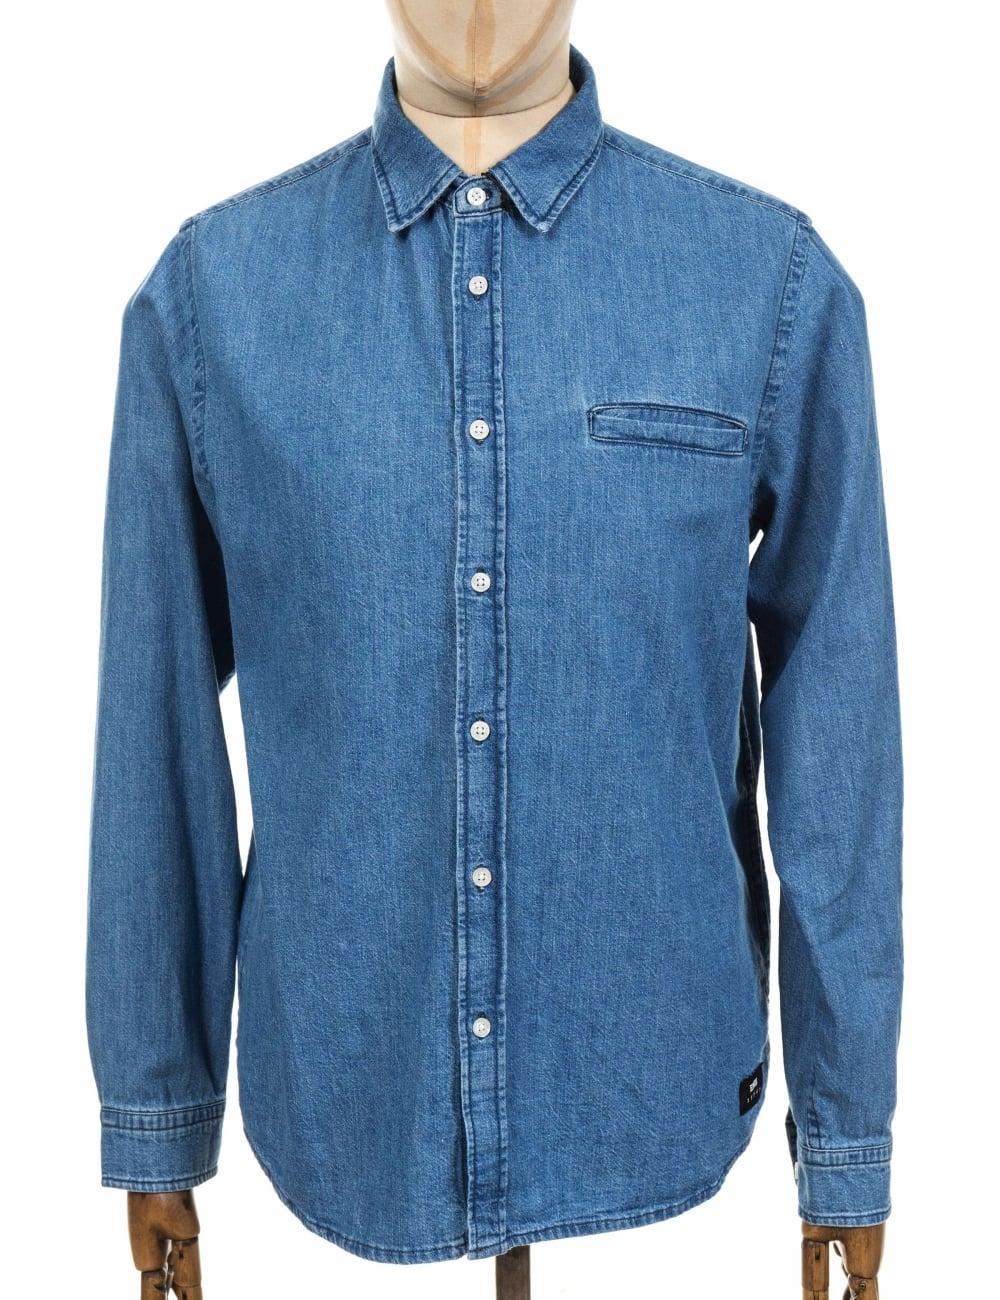 084b1b6f4051f edwin-jeans-l-s-better-shirt-light-stone-washed-p19719-74973 image.jpg